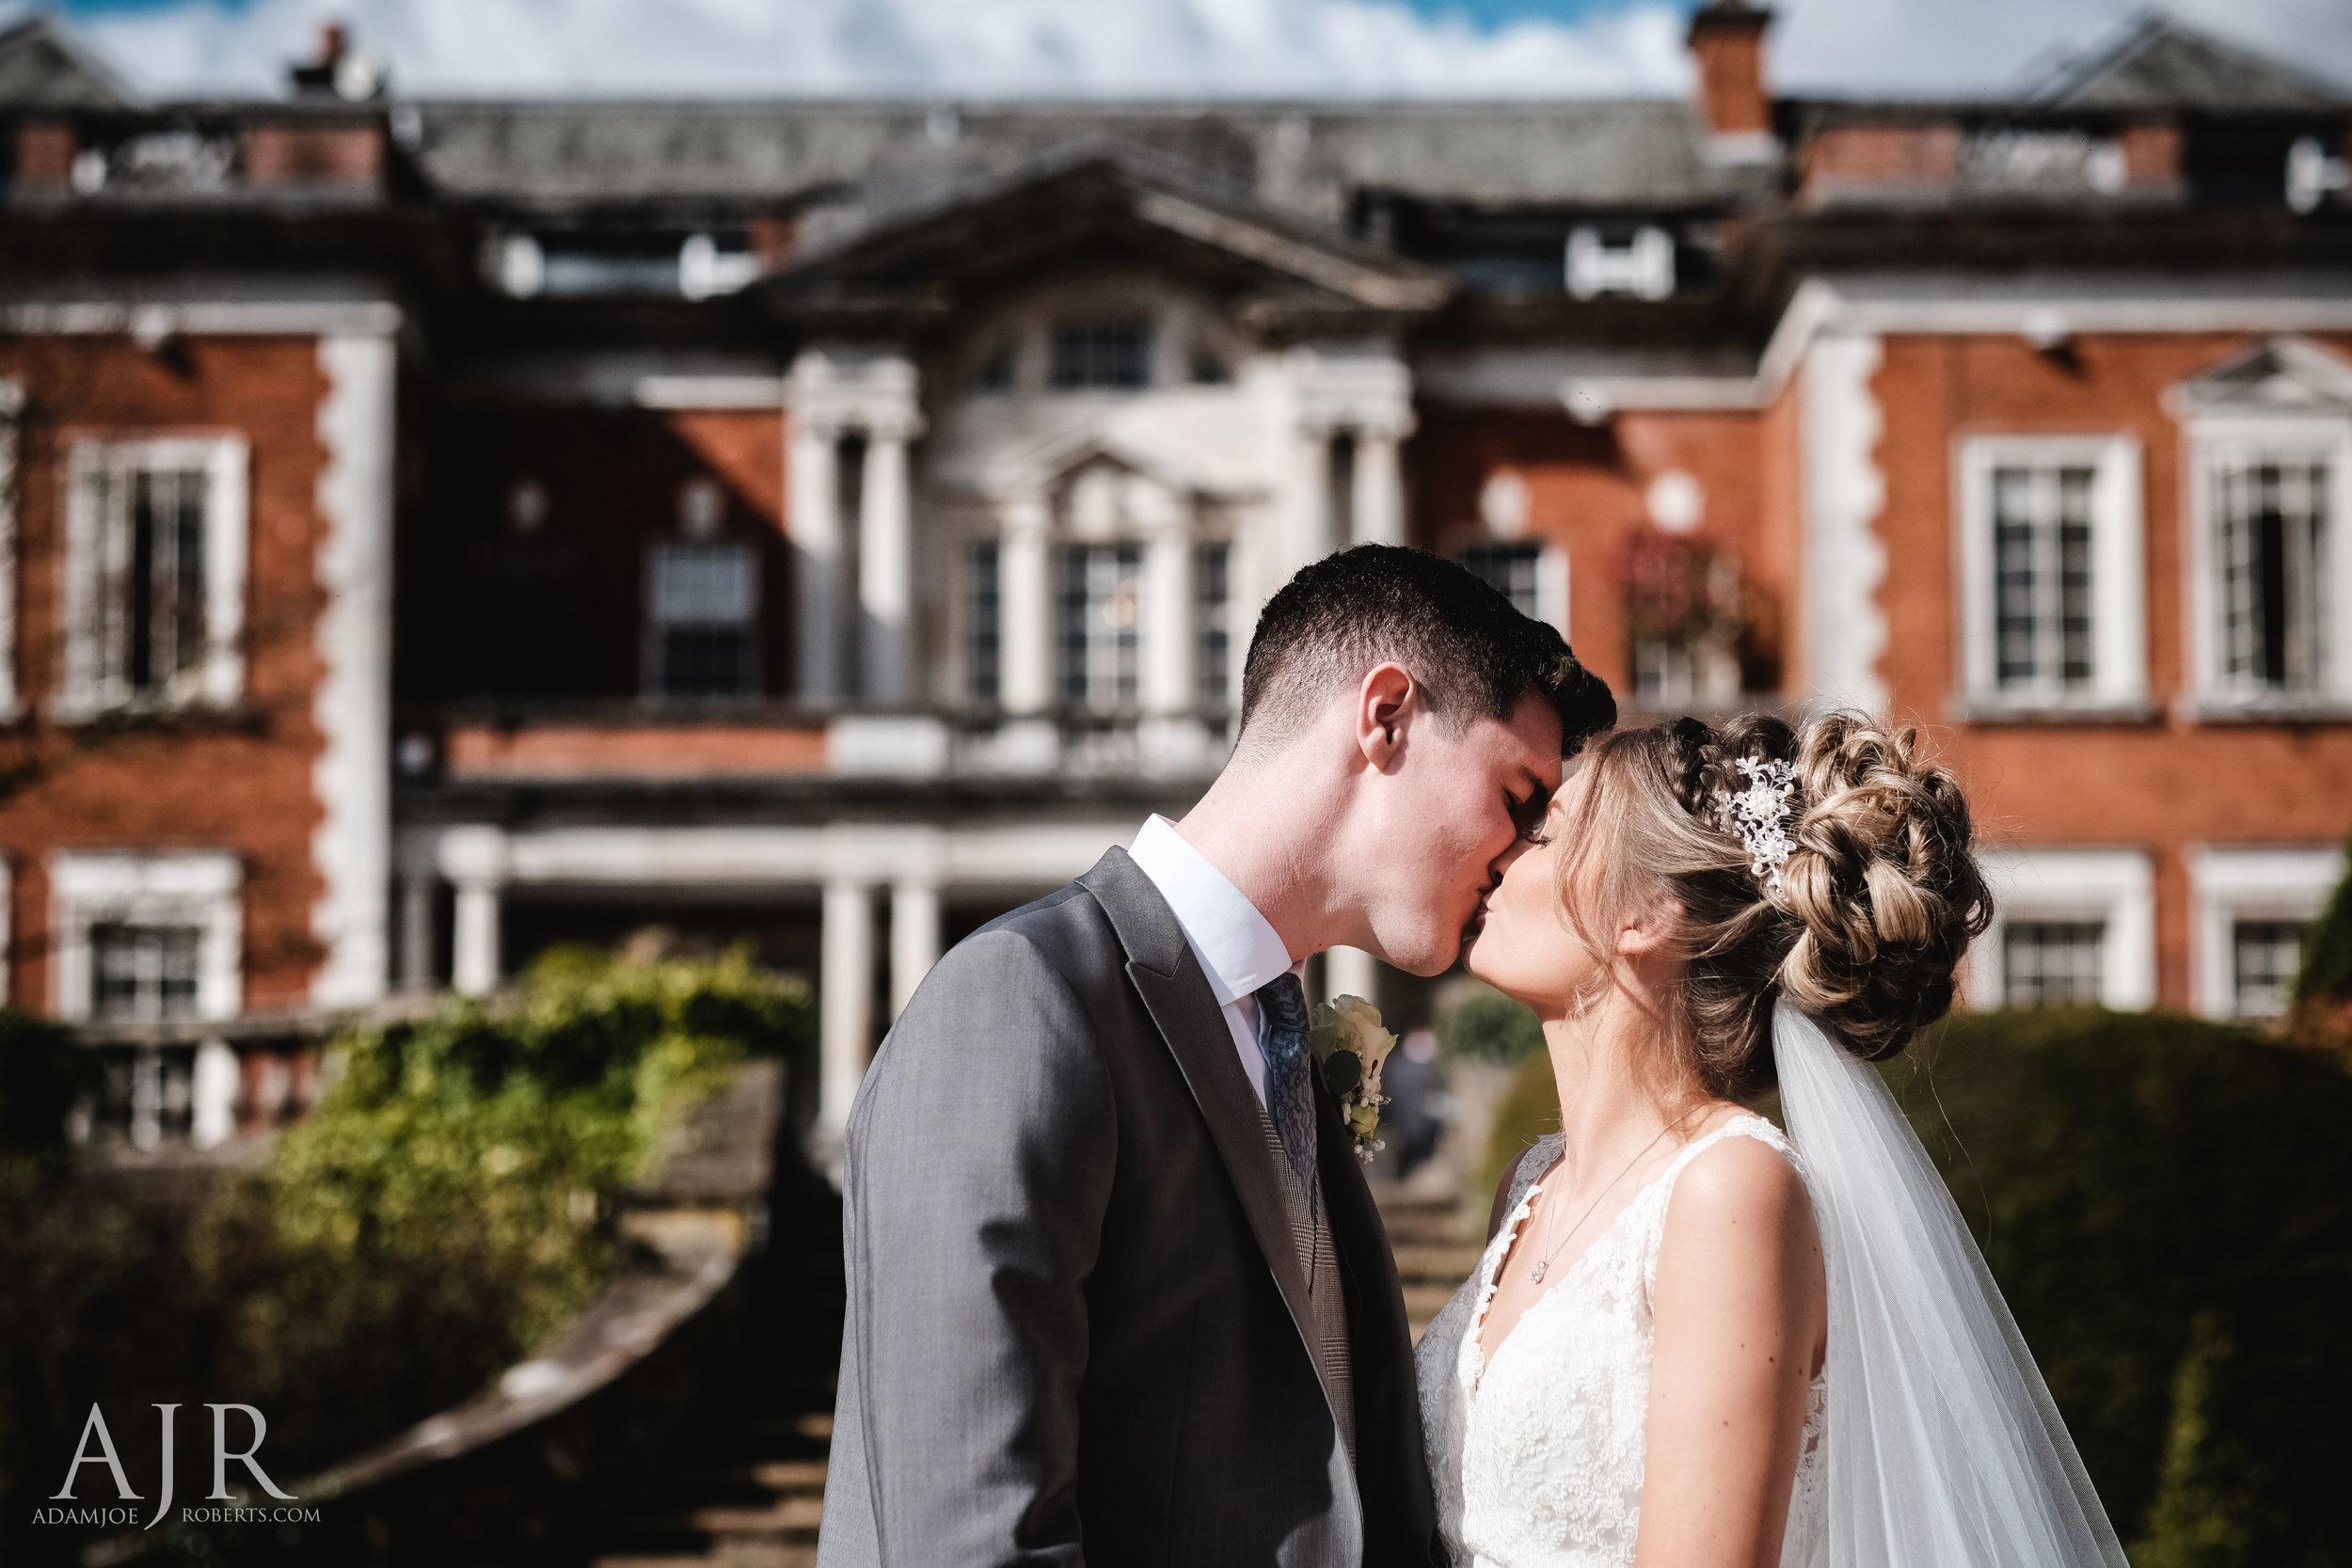 Eaves hall documenrty wedding photography | widnes cheshire wedding photographer sneak peek (10 of 11).jpg